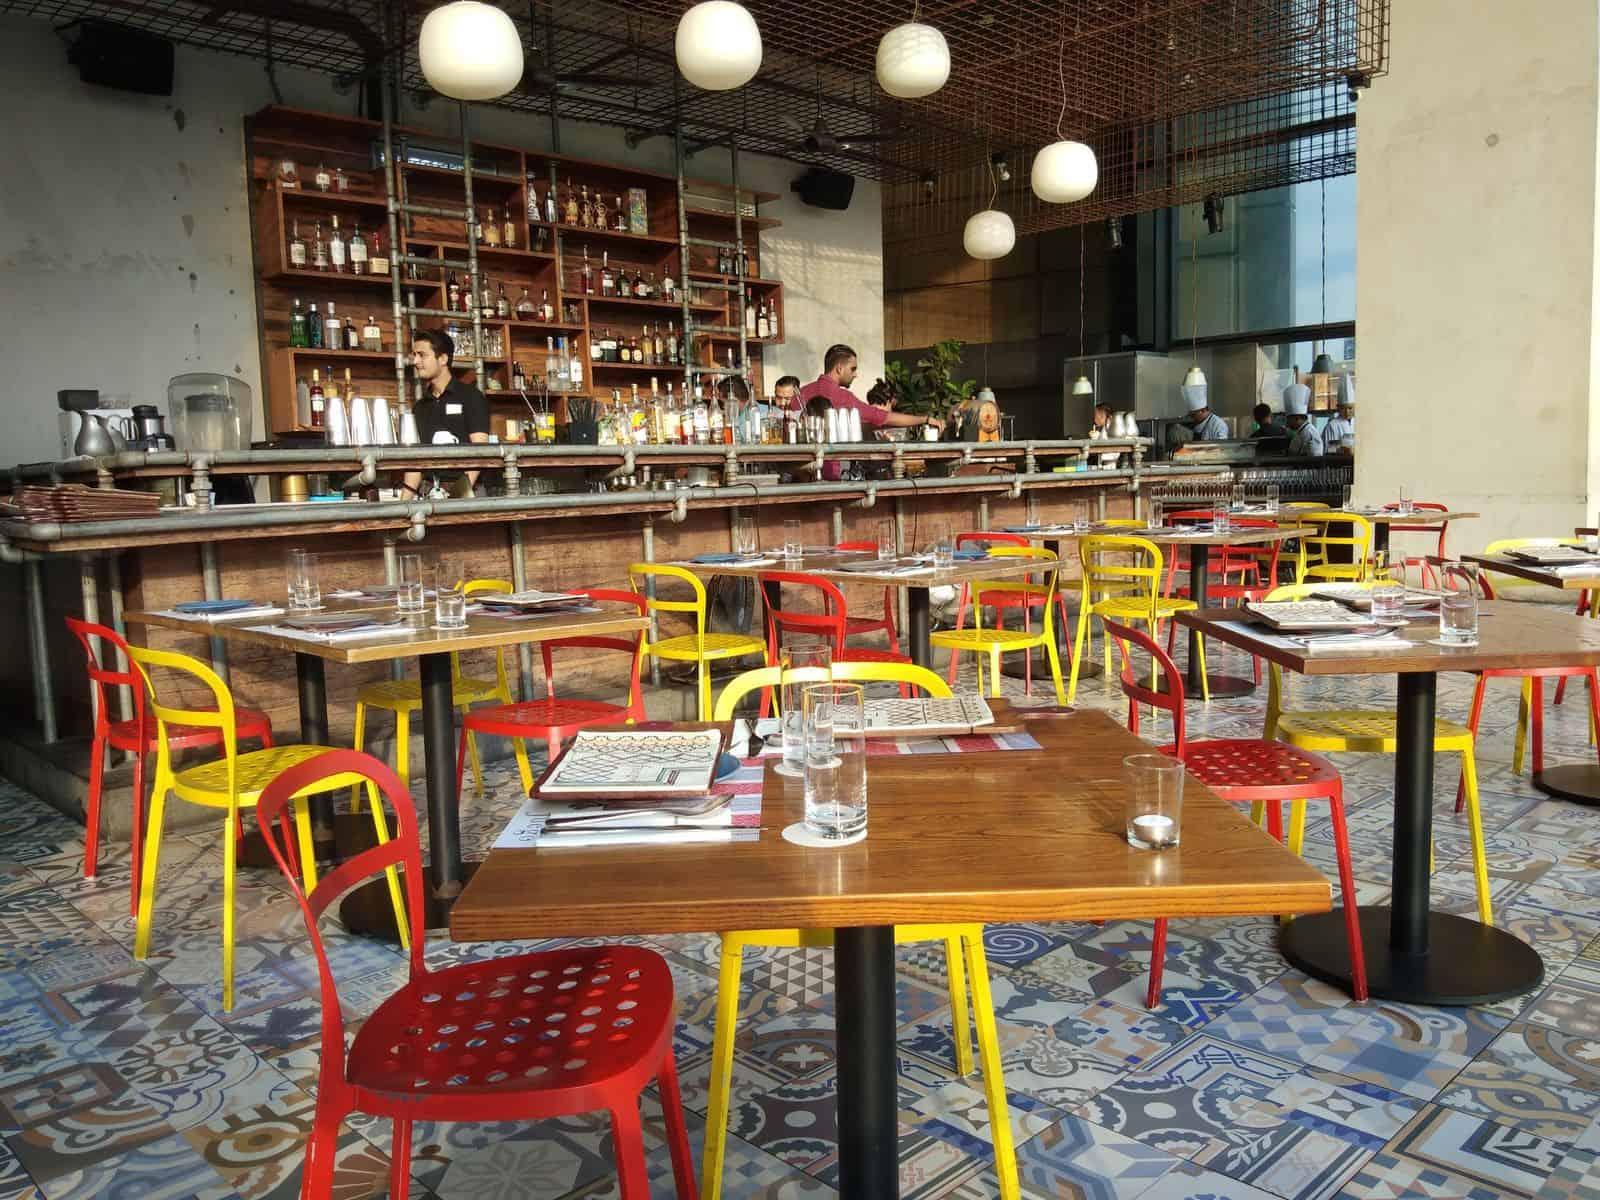 Fuegos-modern-South-American-restaurant-KLCC-Kuala-Lumpur-Malaysia-Travel-Mermaid-15